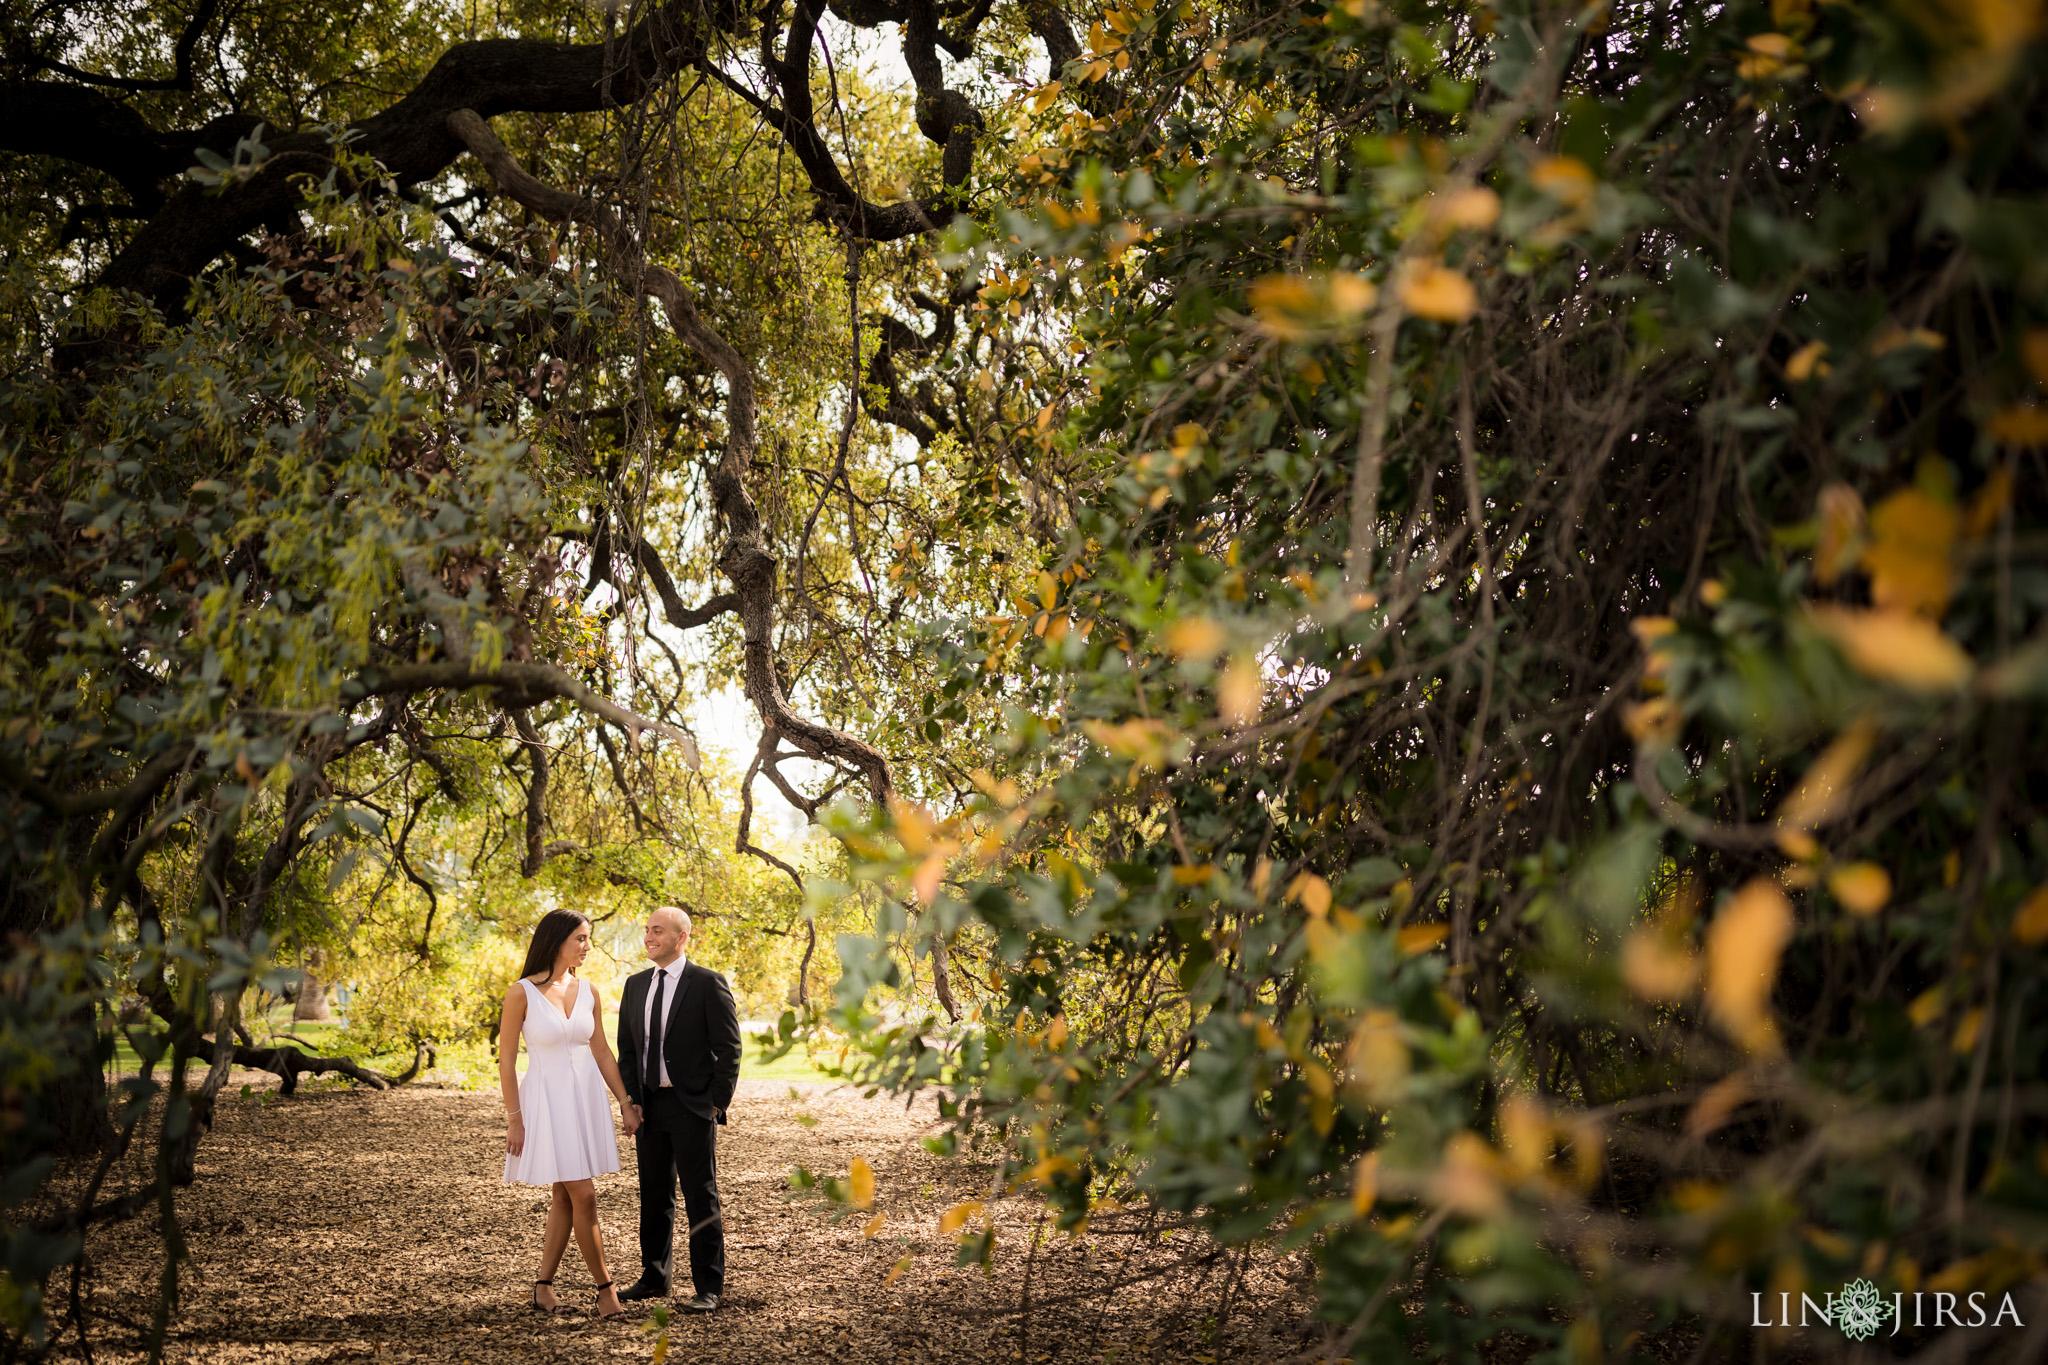 04-Los-angeles-arboretum-engagement-photography